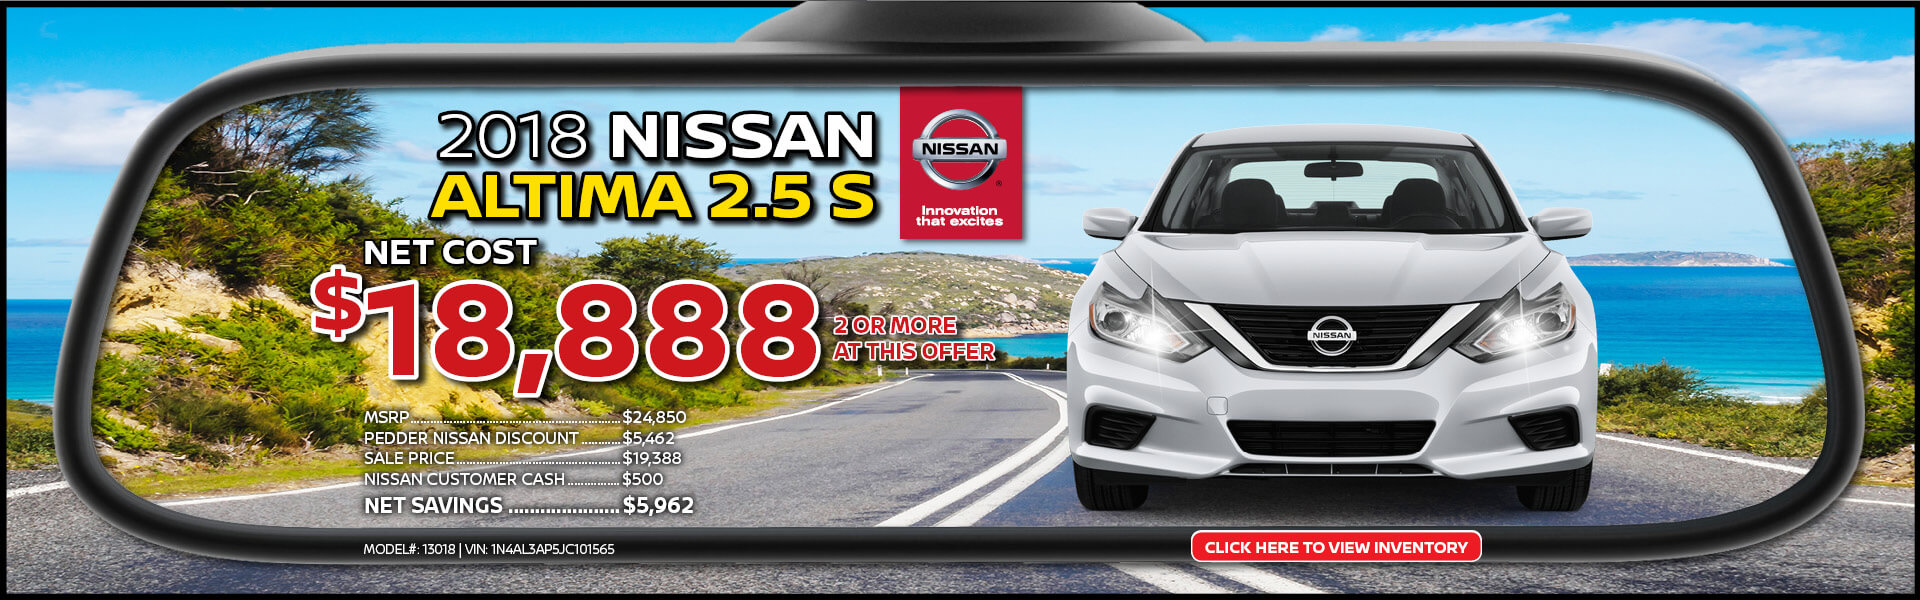 Nissan Altima $18,888 Purchase